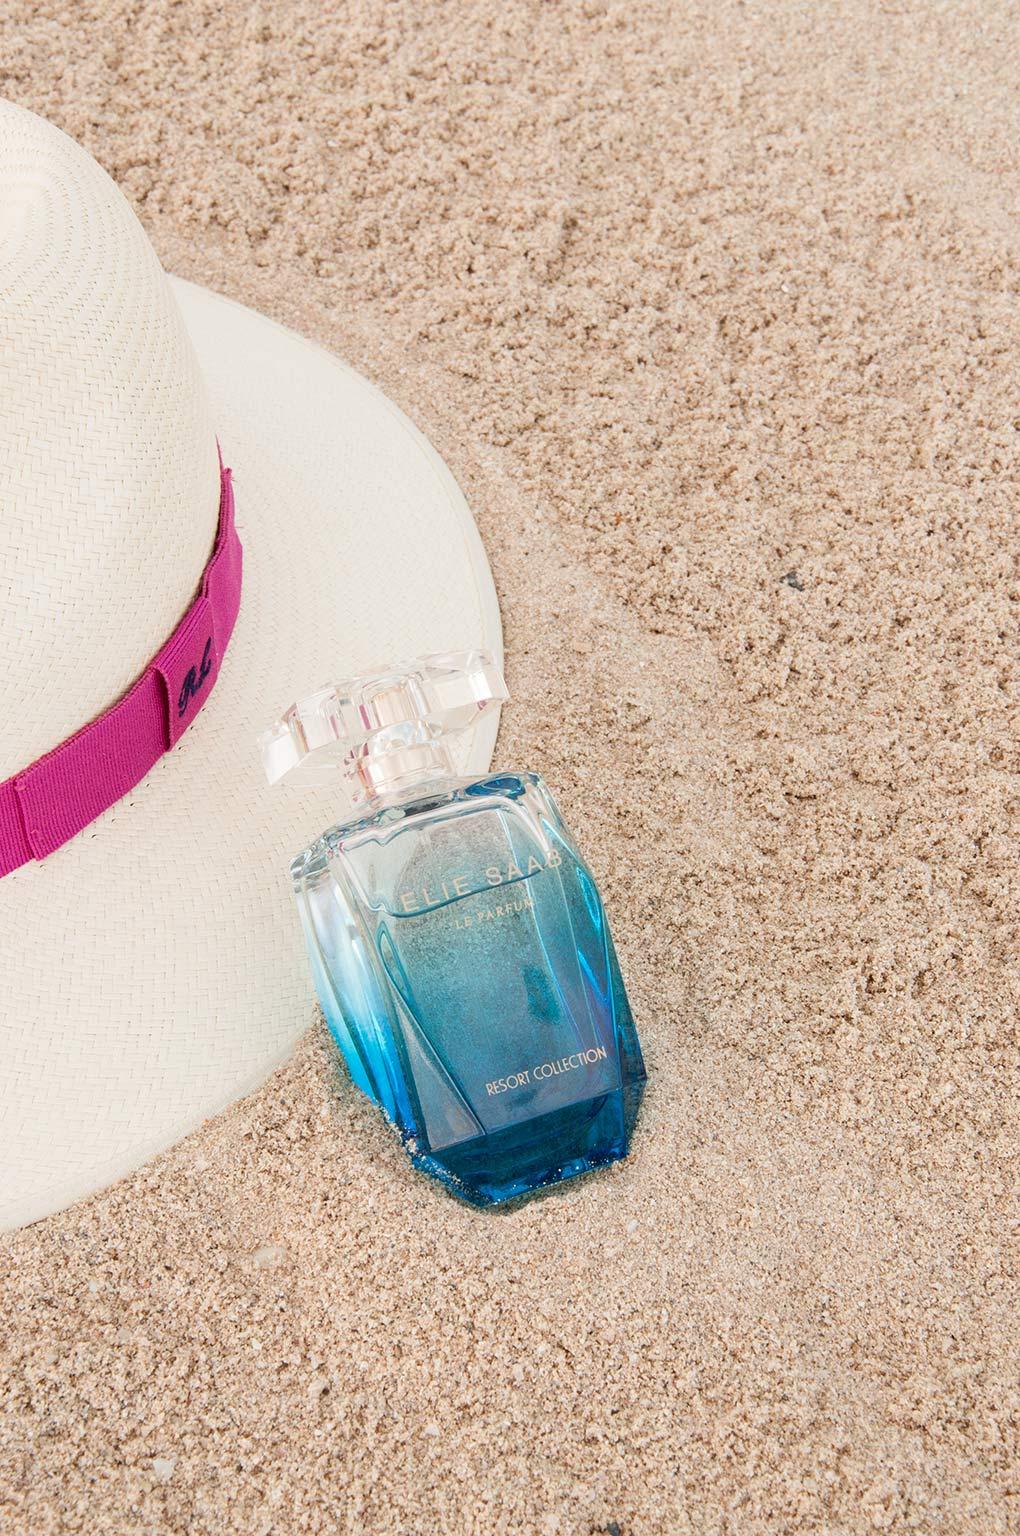 Lyla_Love_Fashion_Elie_Saab_La_Perfume_Resort_collection_5527